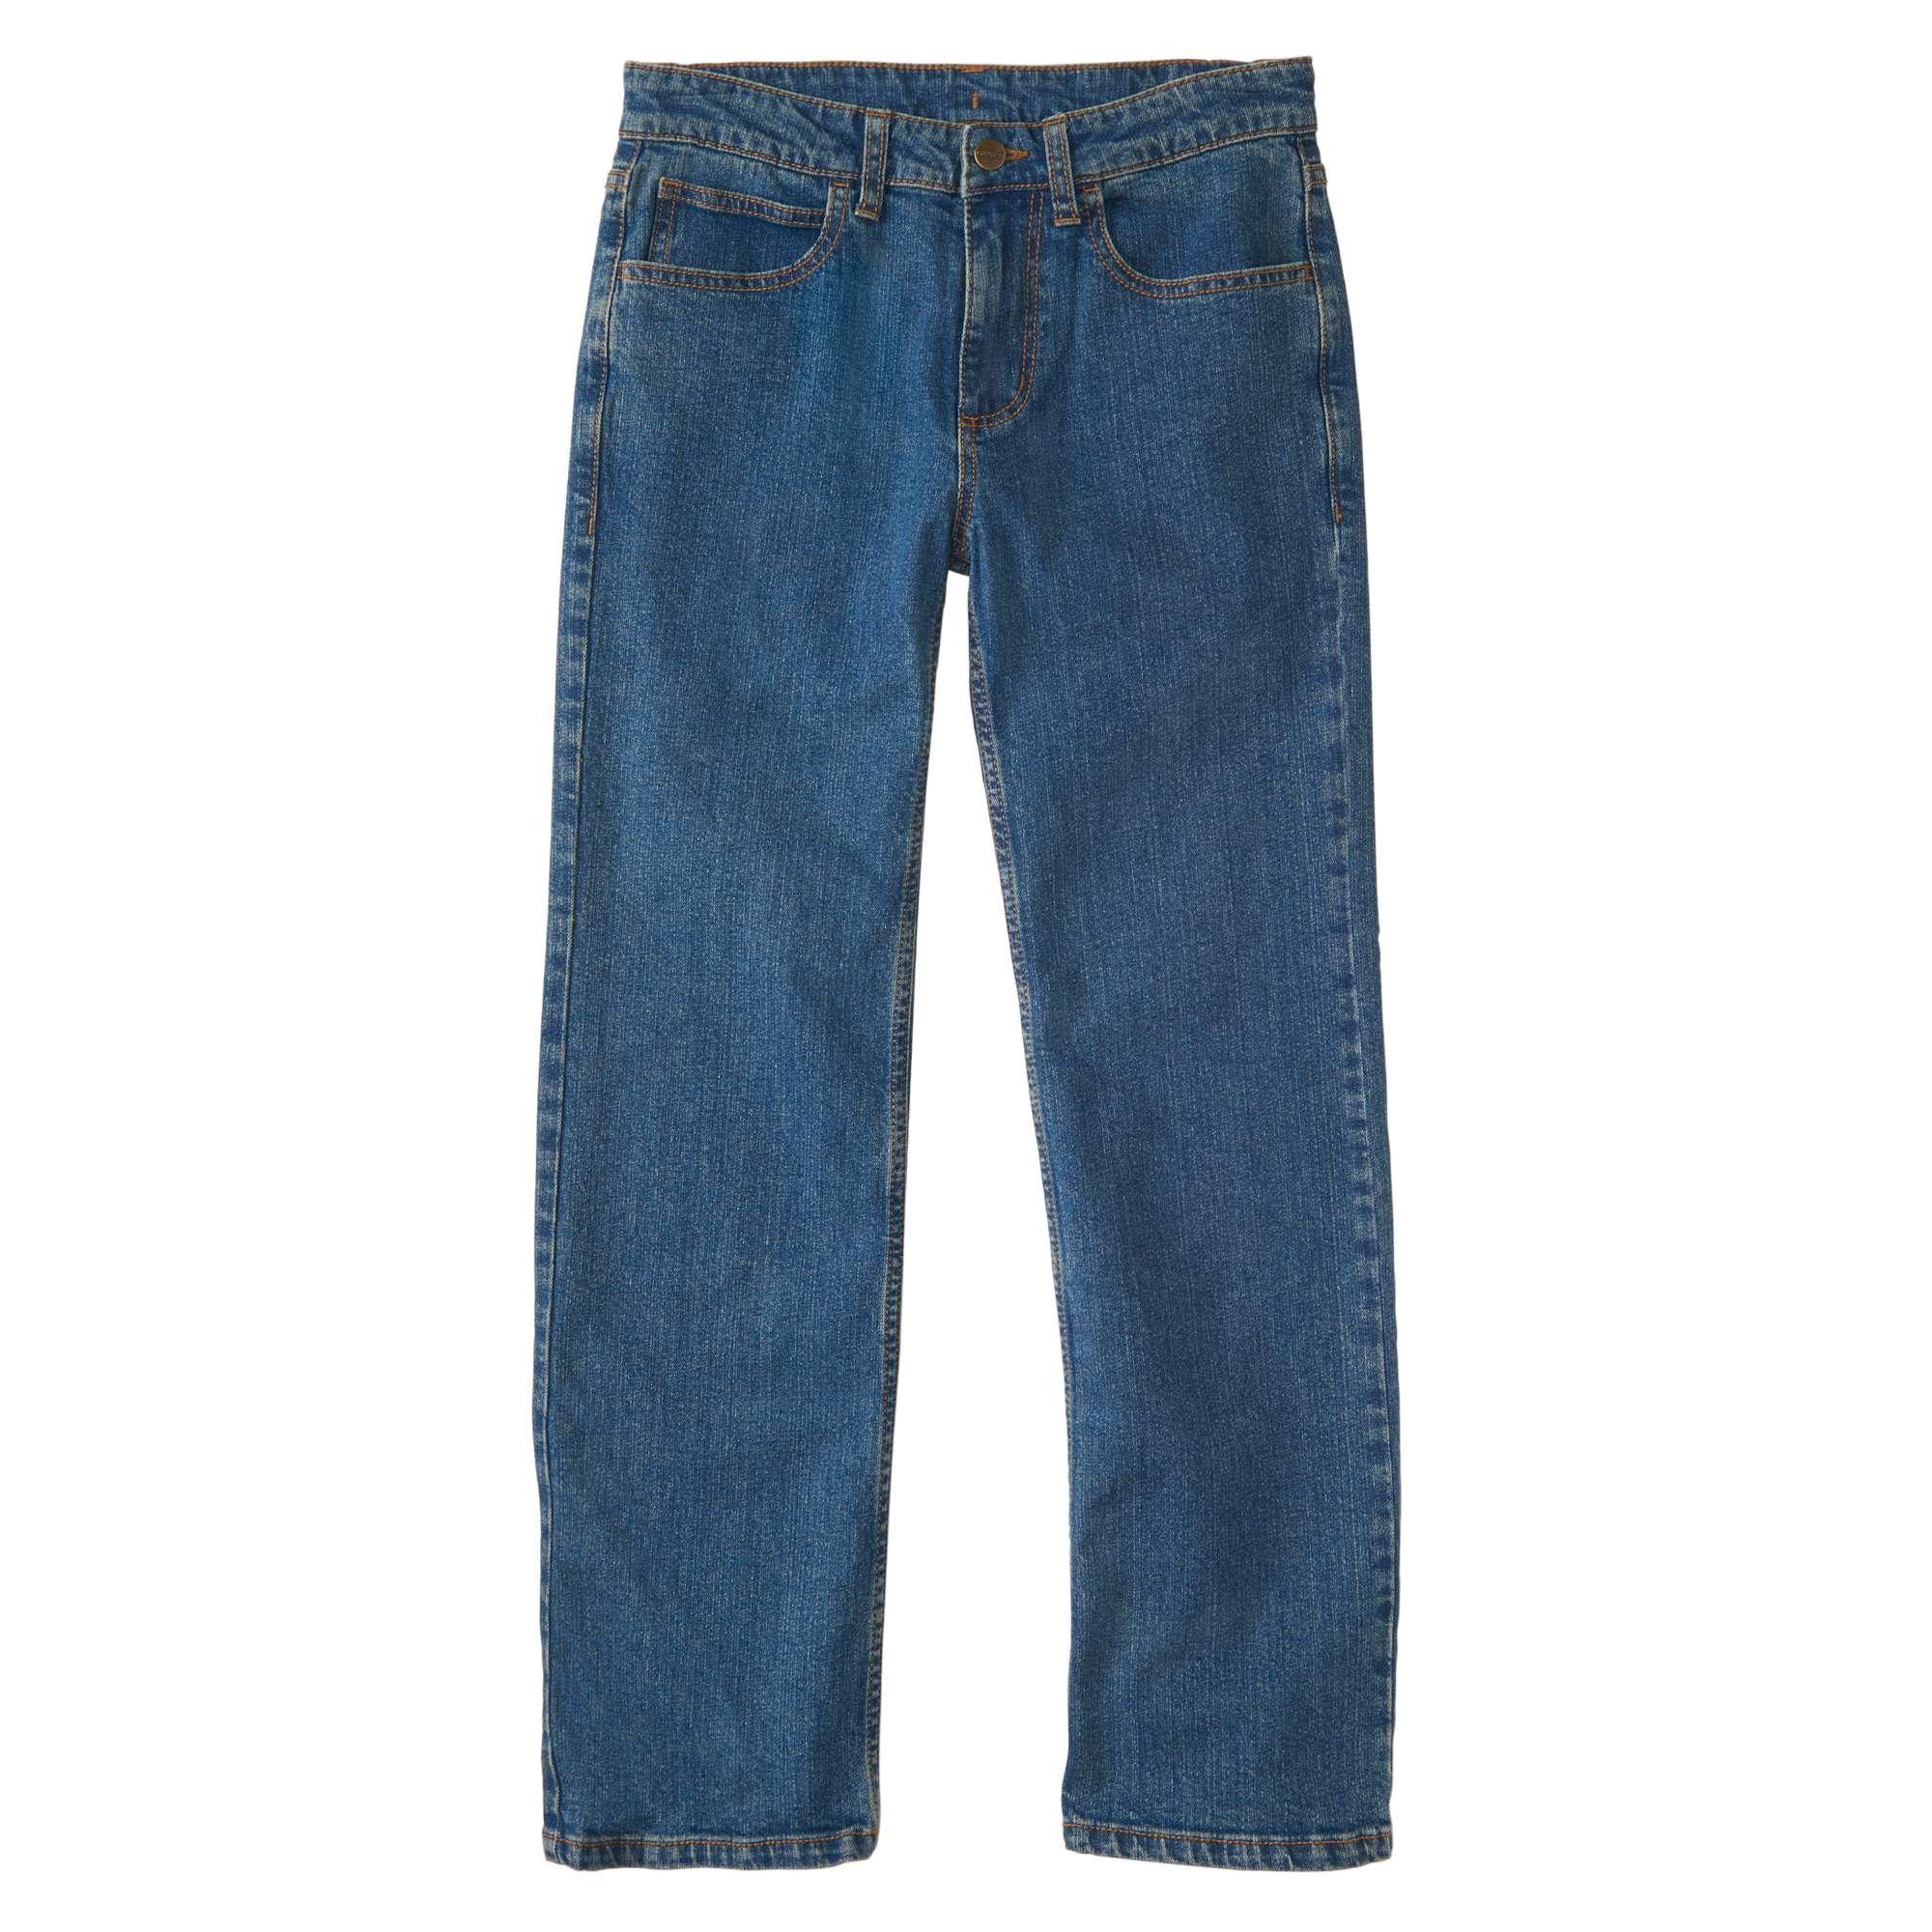 Carhartt Denim 5-Pocket Jean